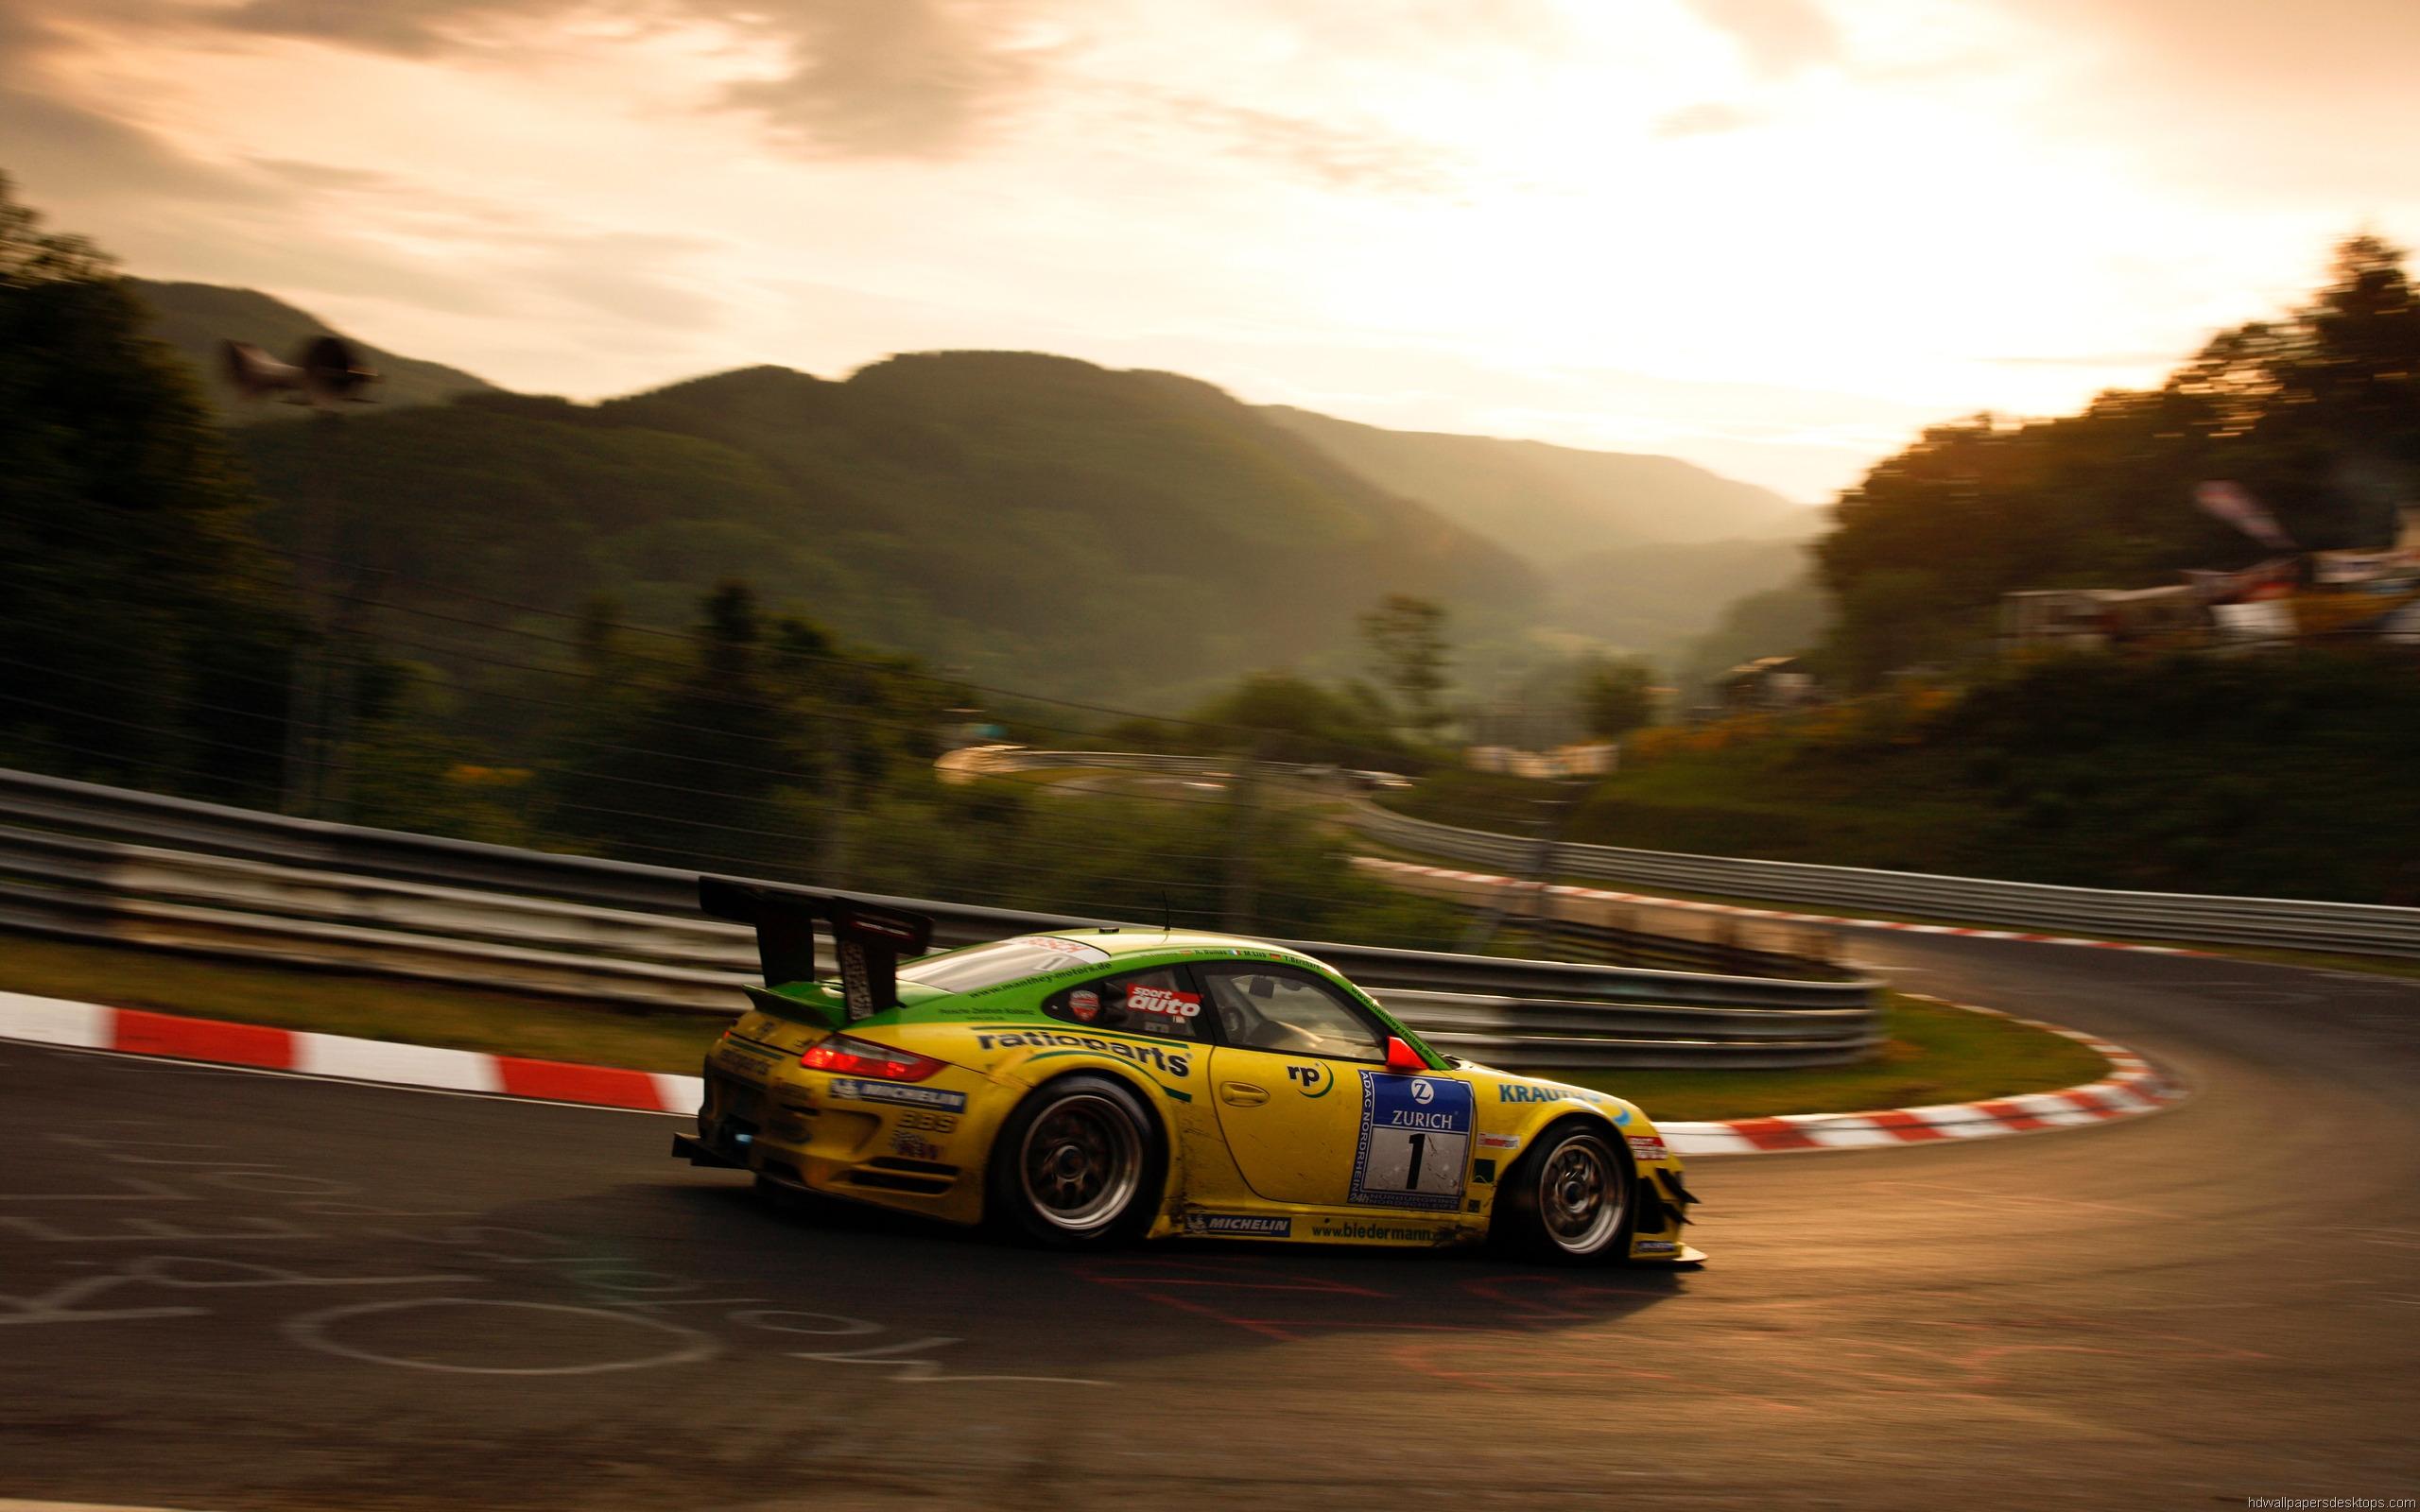 Thunderhill Race Car Wallpaper: HD Car Wallpapers For Desktop